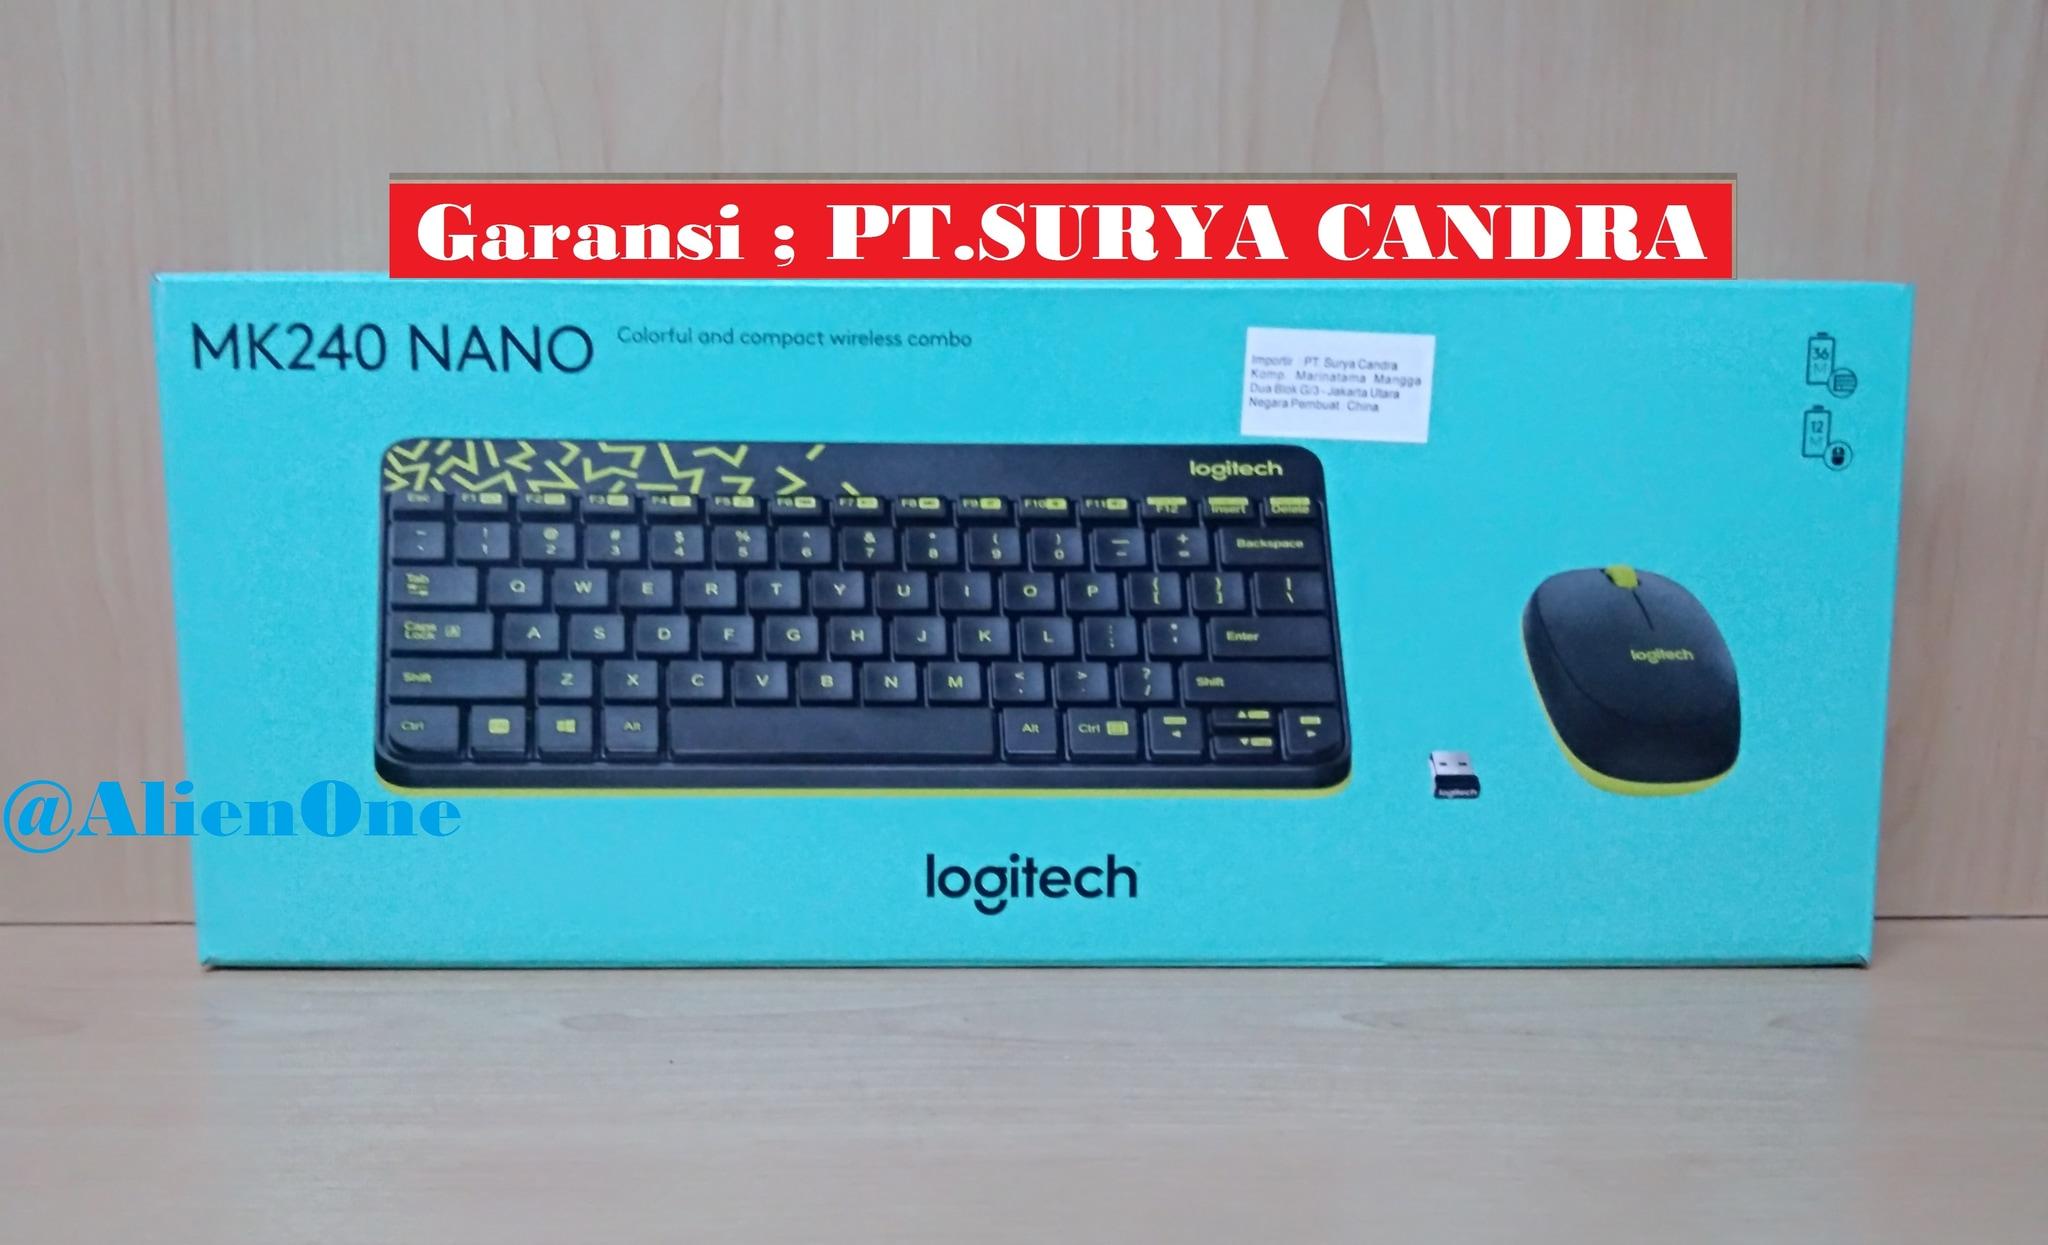 Jual Logitech Mk240 Wireless Combo Mouse Keyboard Nano Hitam Kuning Alienone Store Tokopedia